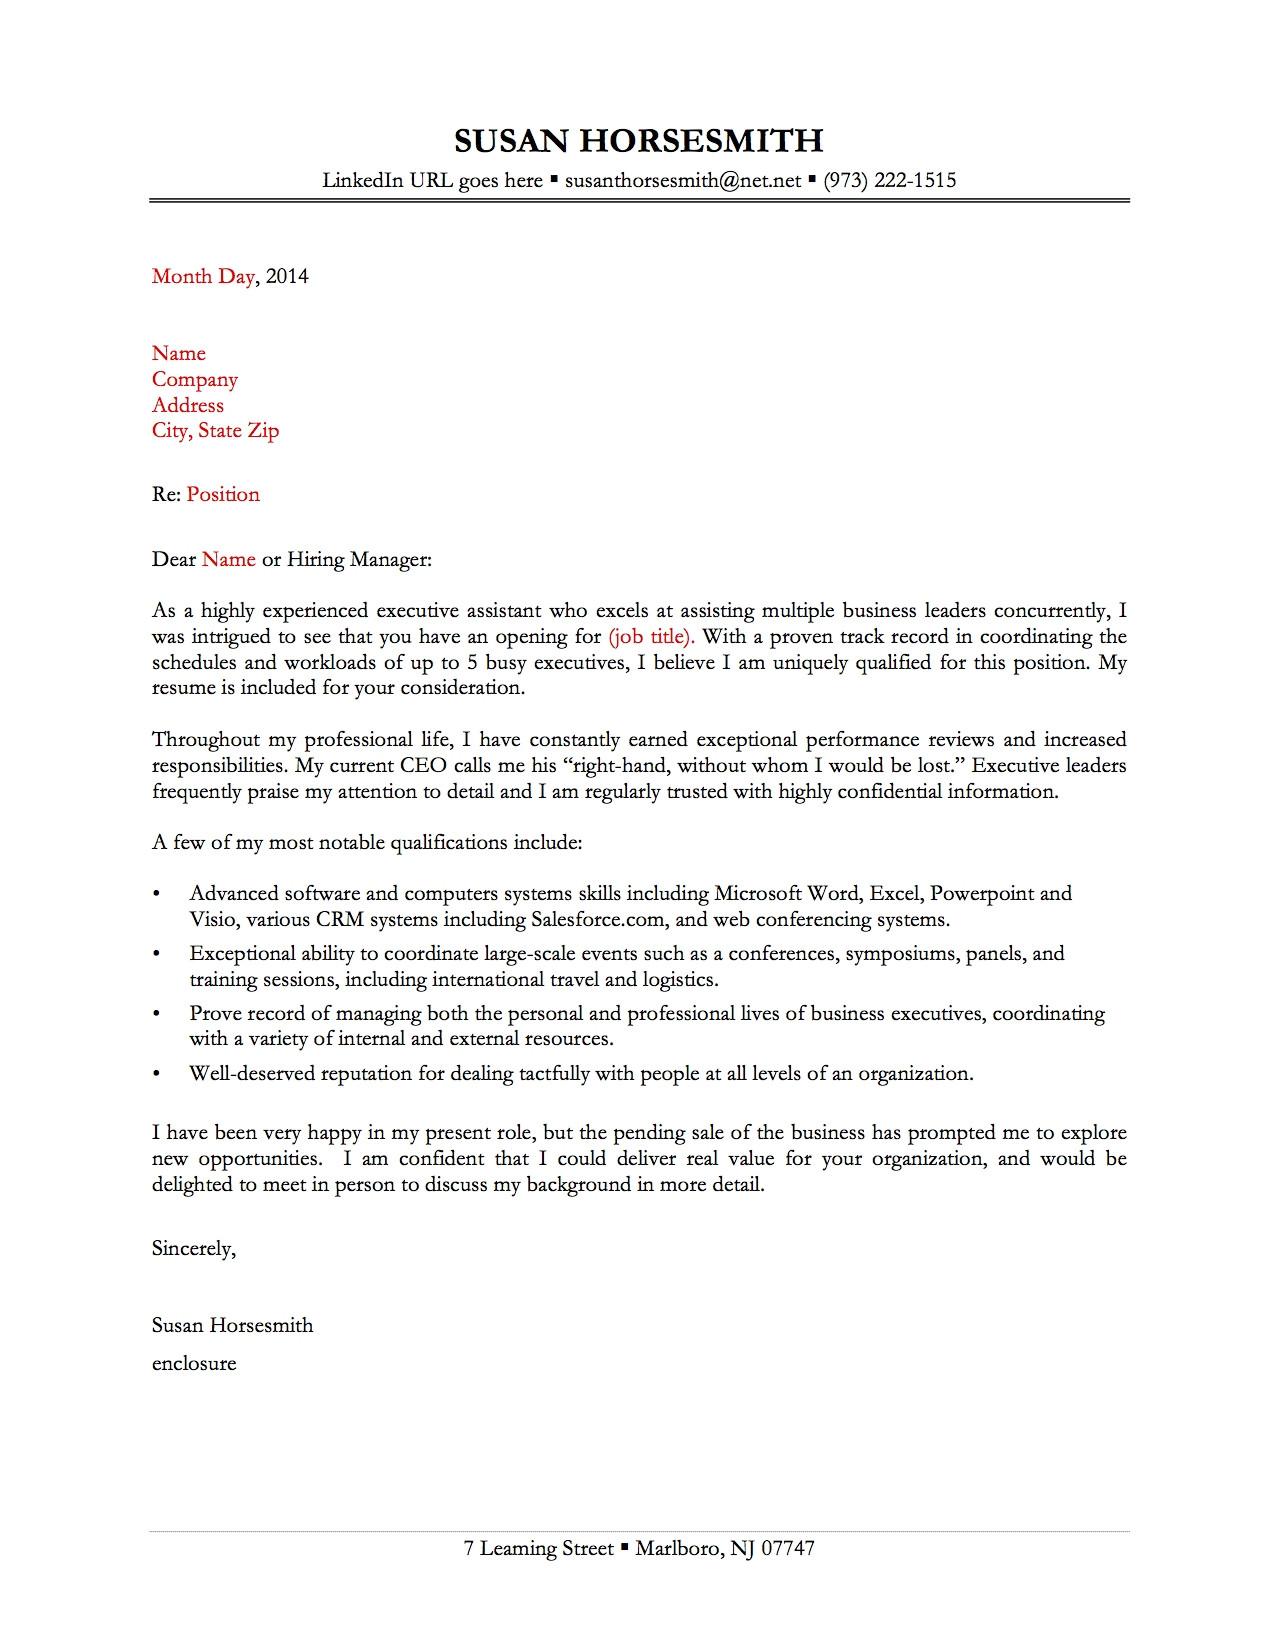 Good Cover Letters for Cv 13 Great Sample Cover Letters Samplebusinessresume Com